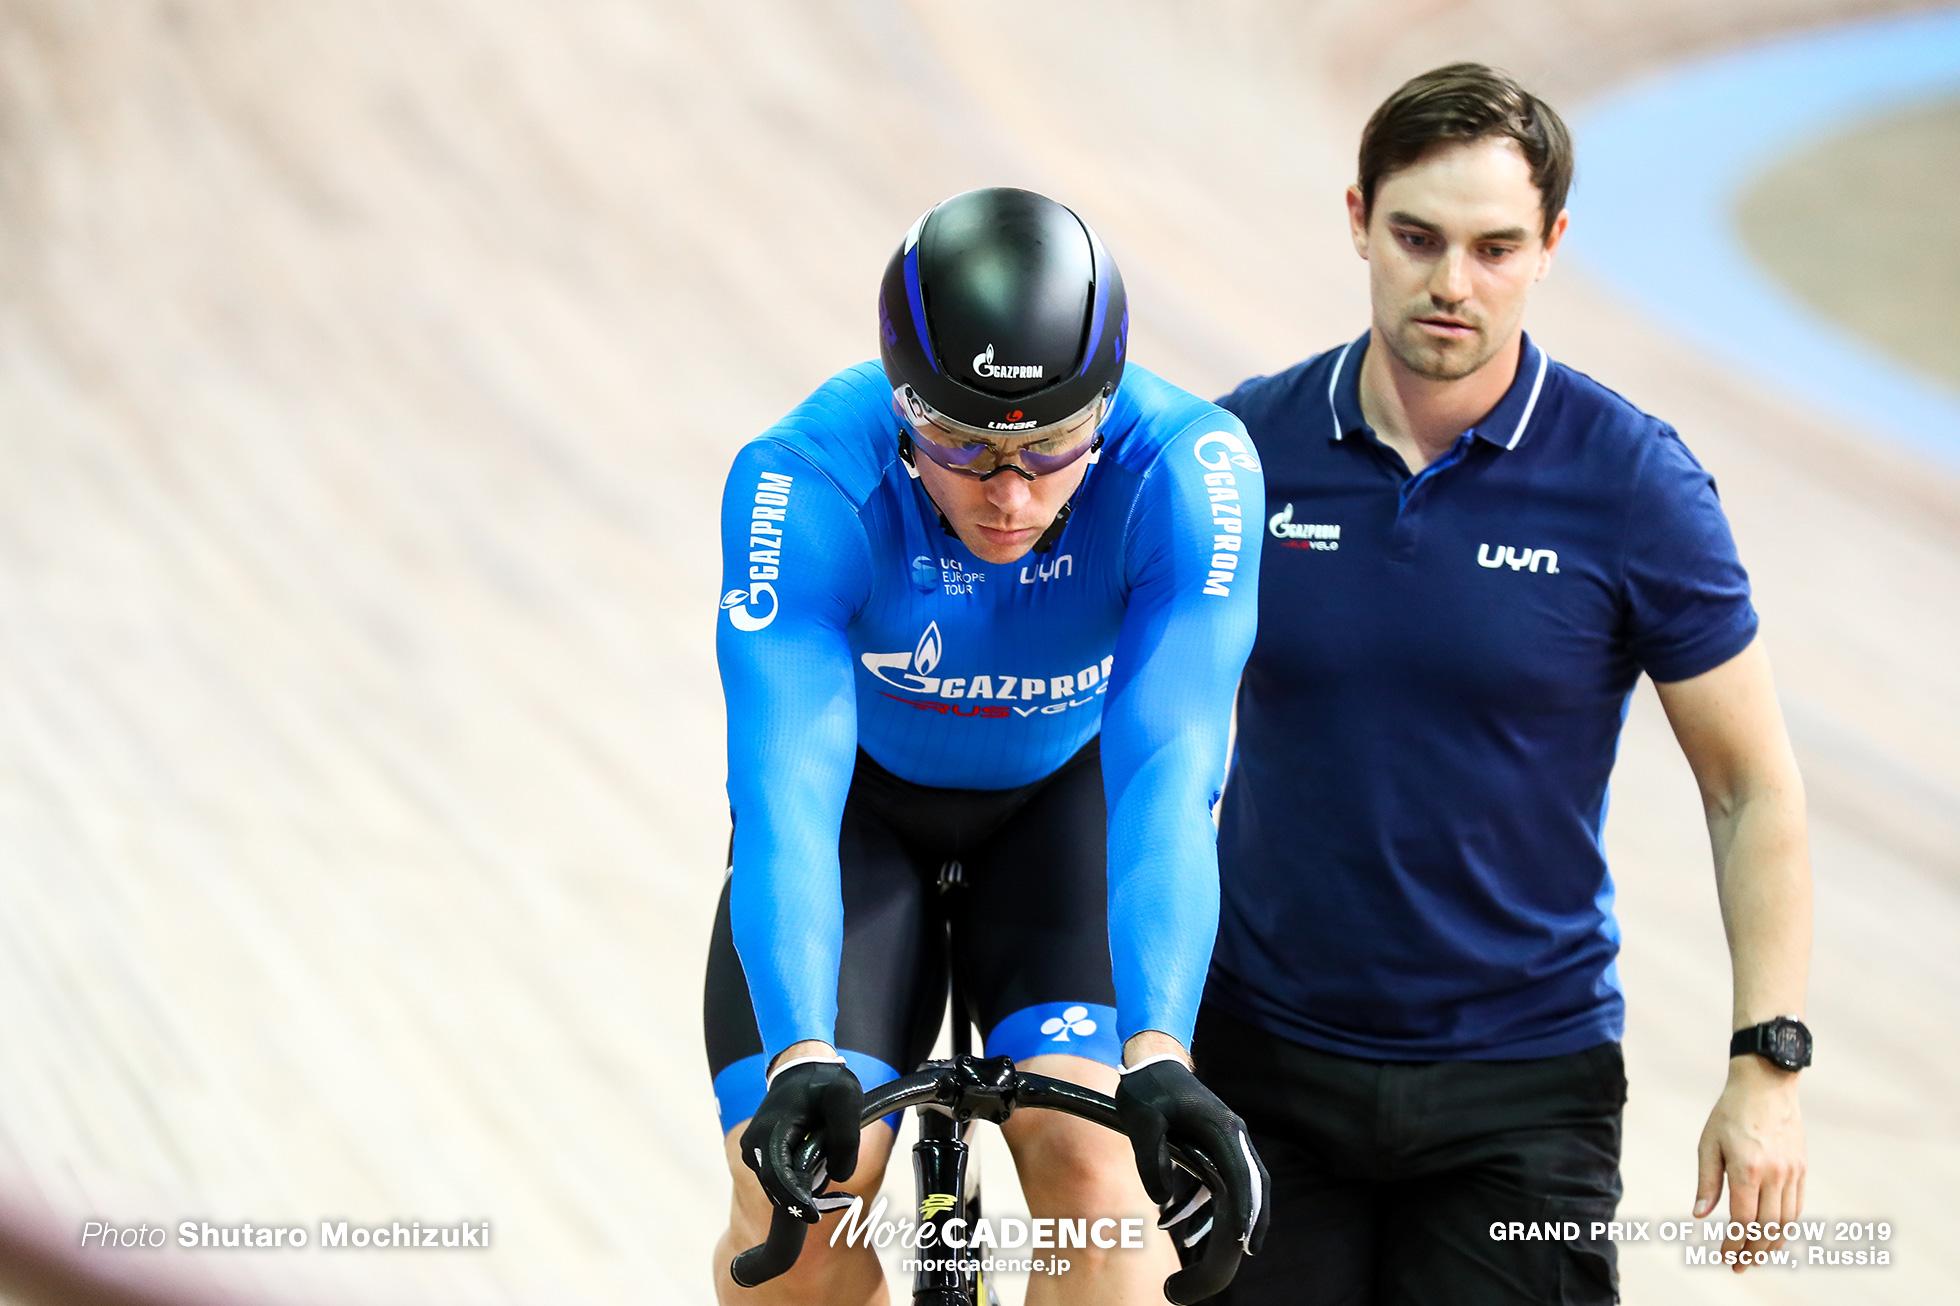 1/8 Finals Repechage / Men's Sprint / GRAND PRIX OF MOSCOW 2019